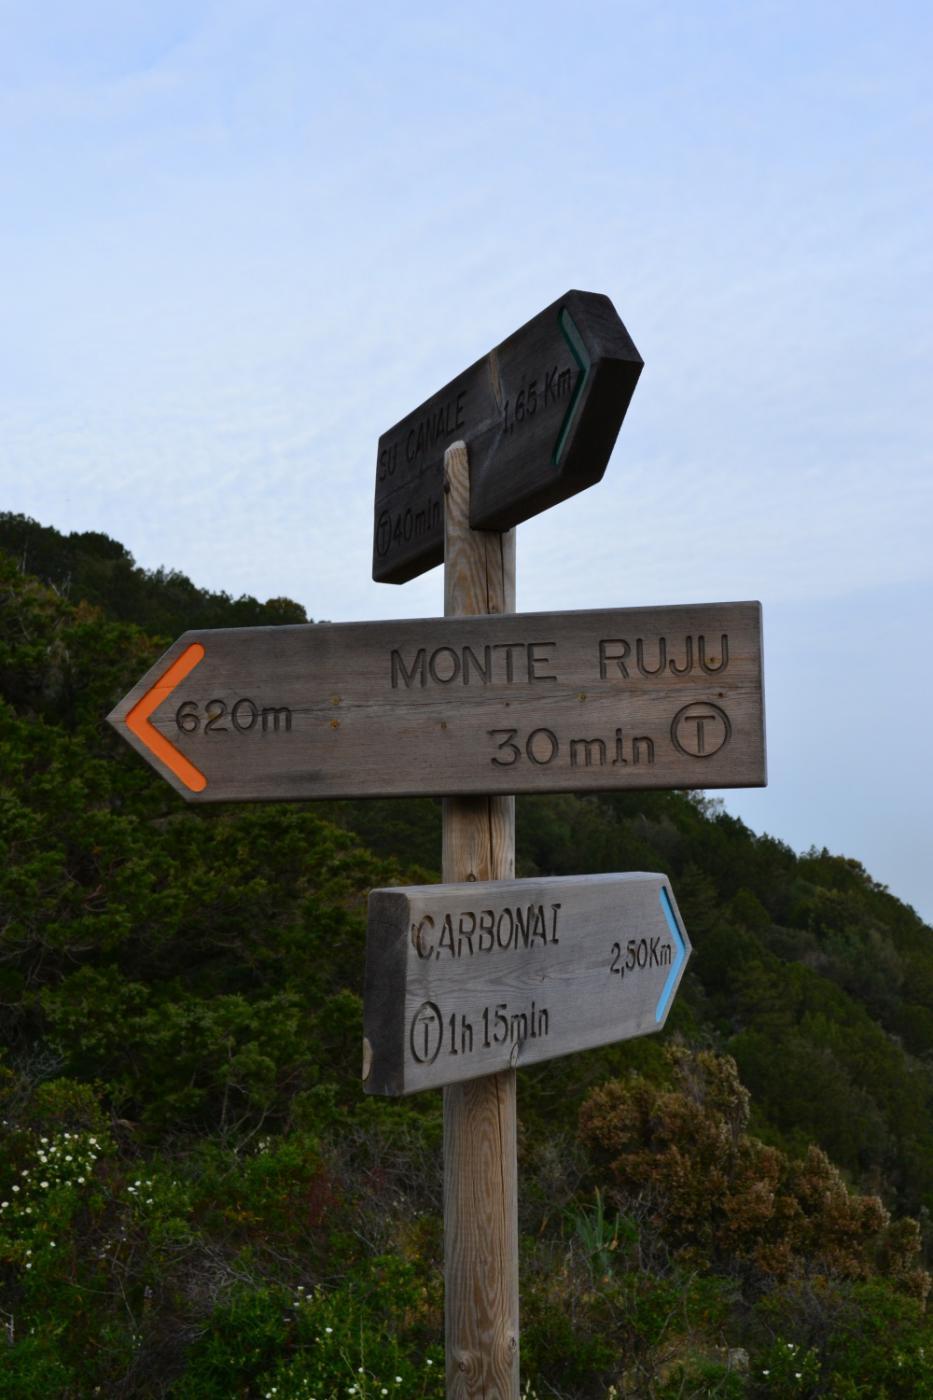 bivio Monte Ruju-Carbonai